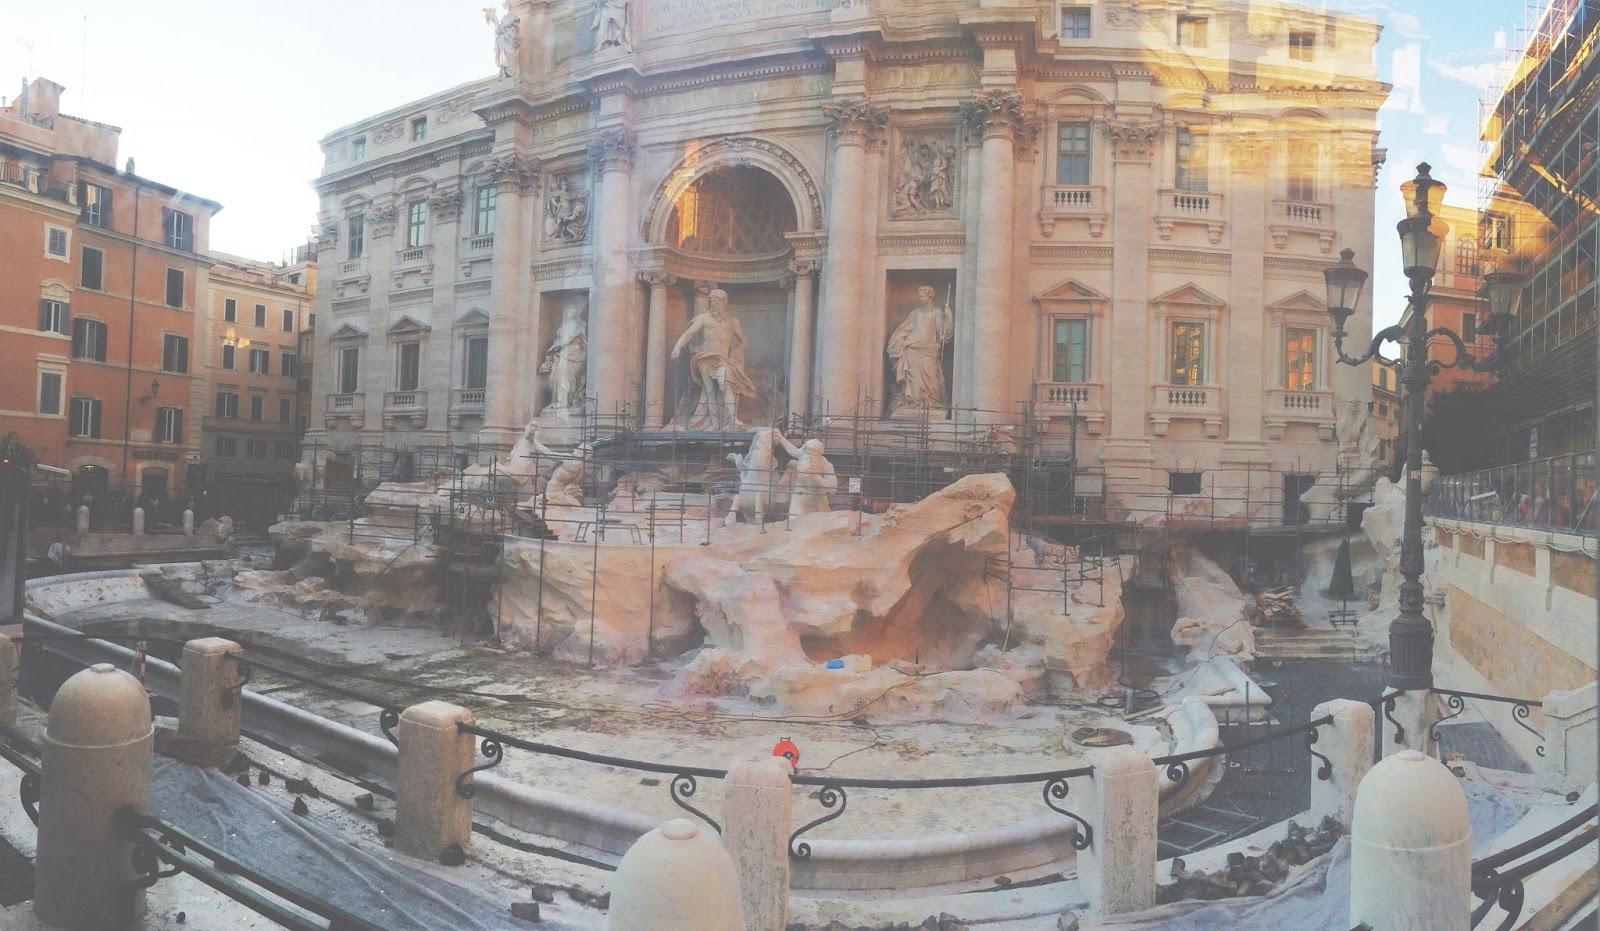 The Trevi Fountain in Rome